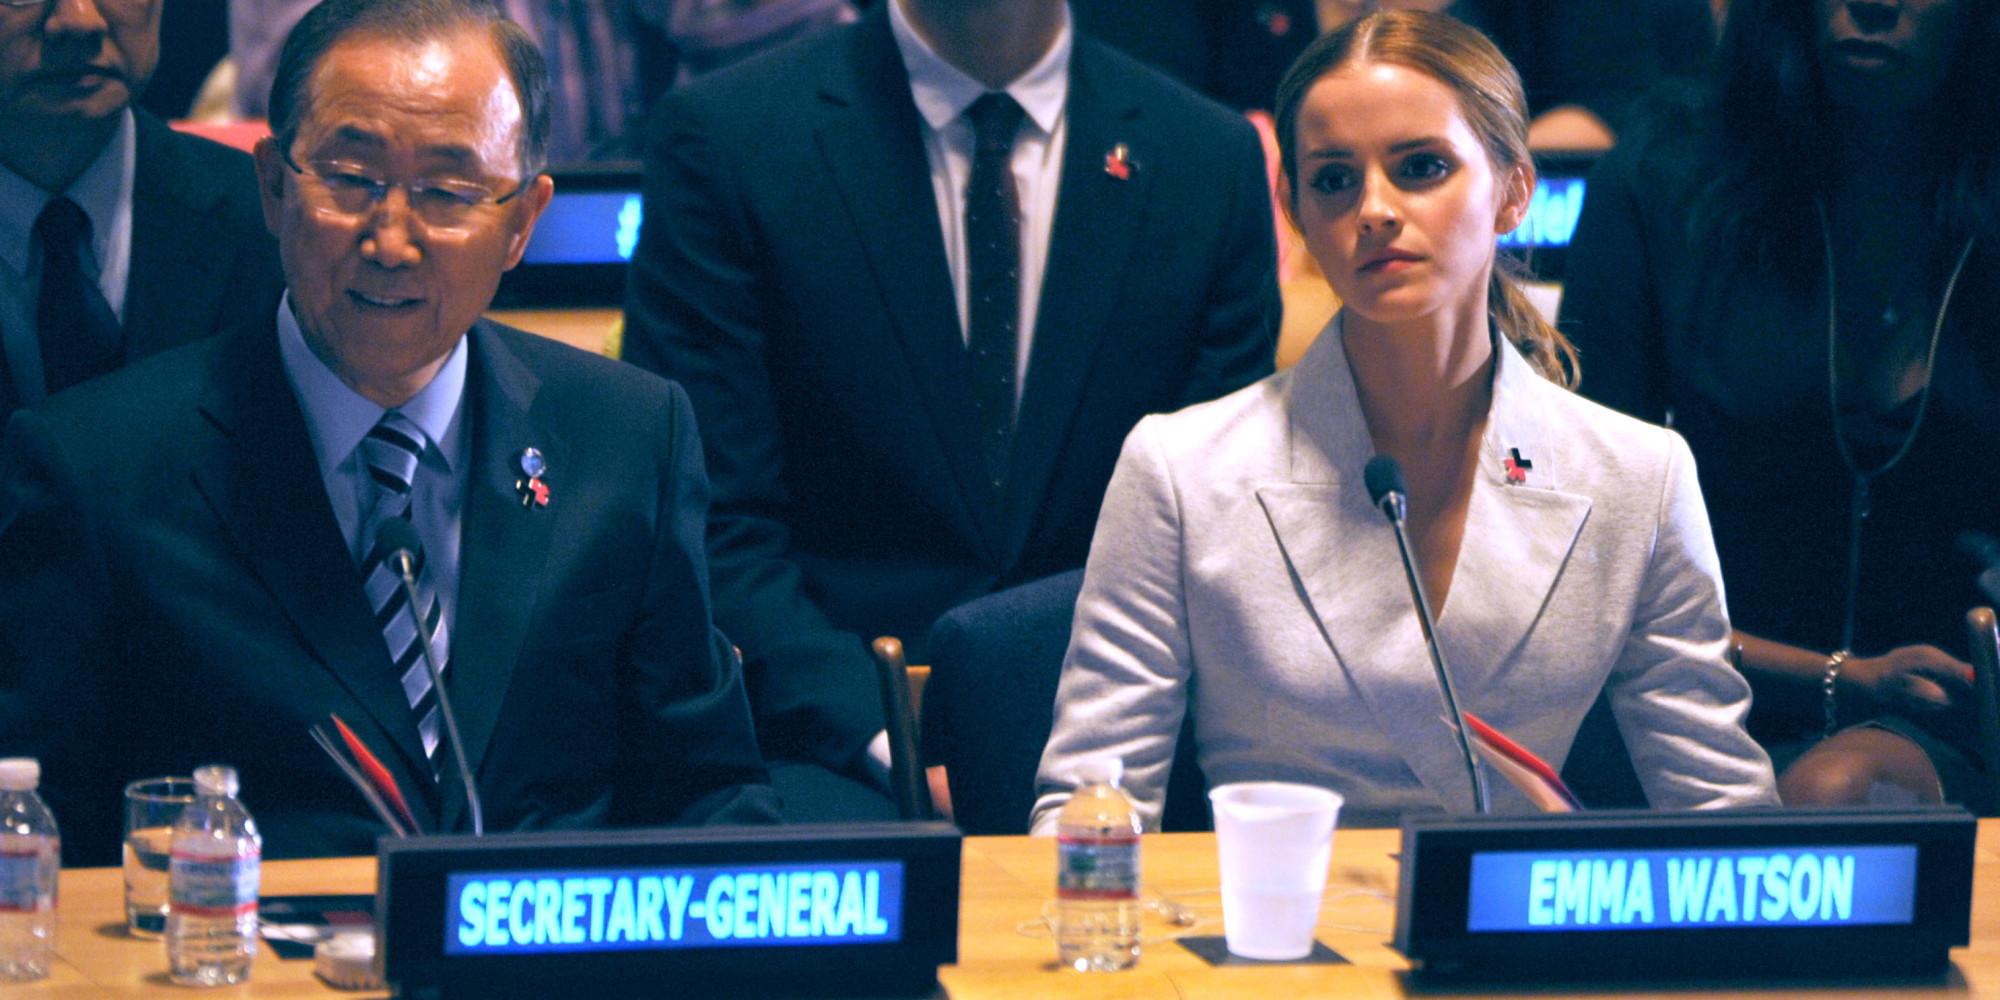 Emma Watson and Ban Ki-Moon